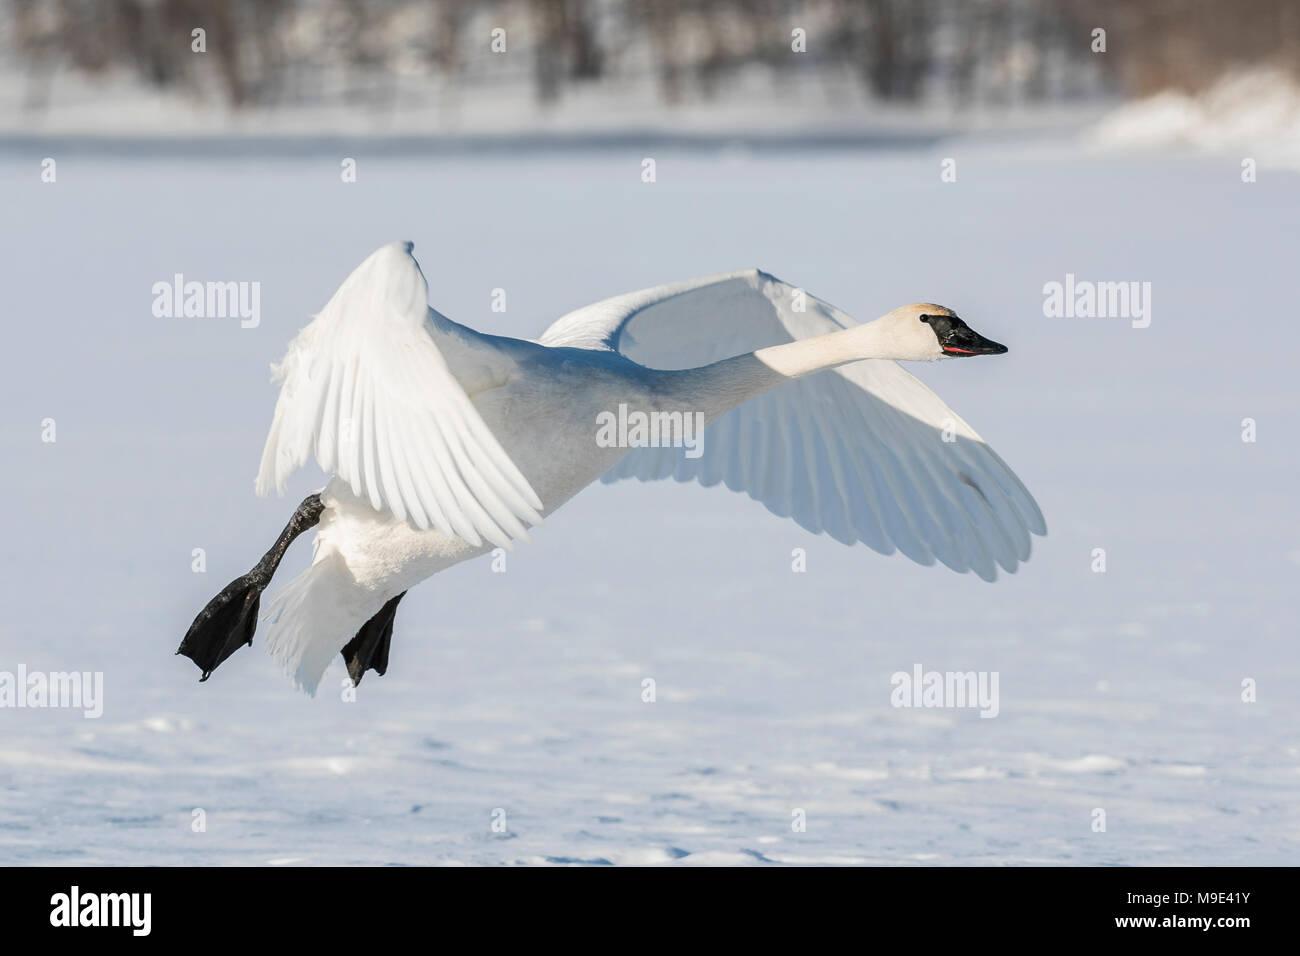 Bird Wing Aerodynamic Stock Photos Amp Bird Wing Aerodynamic